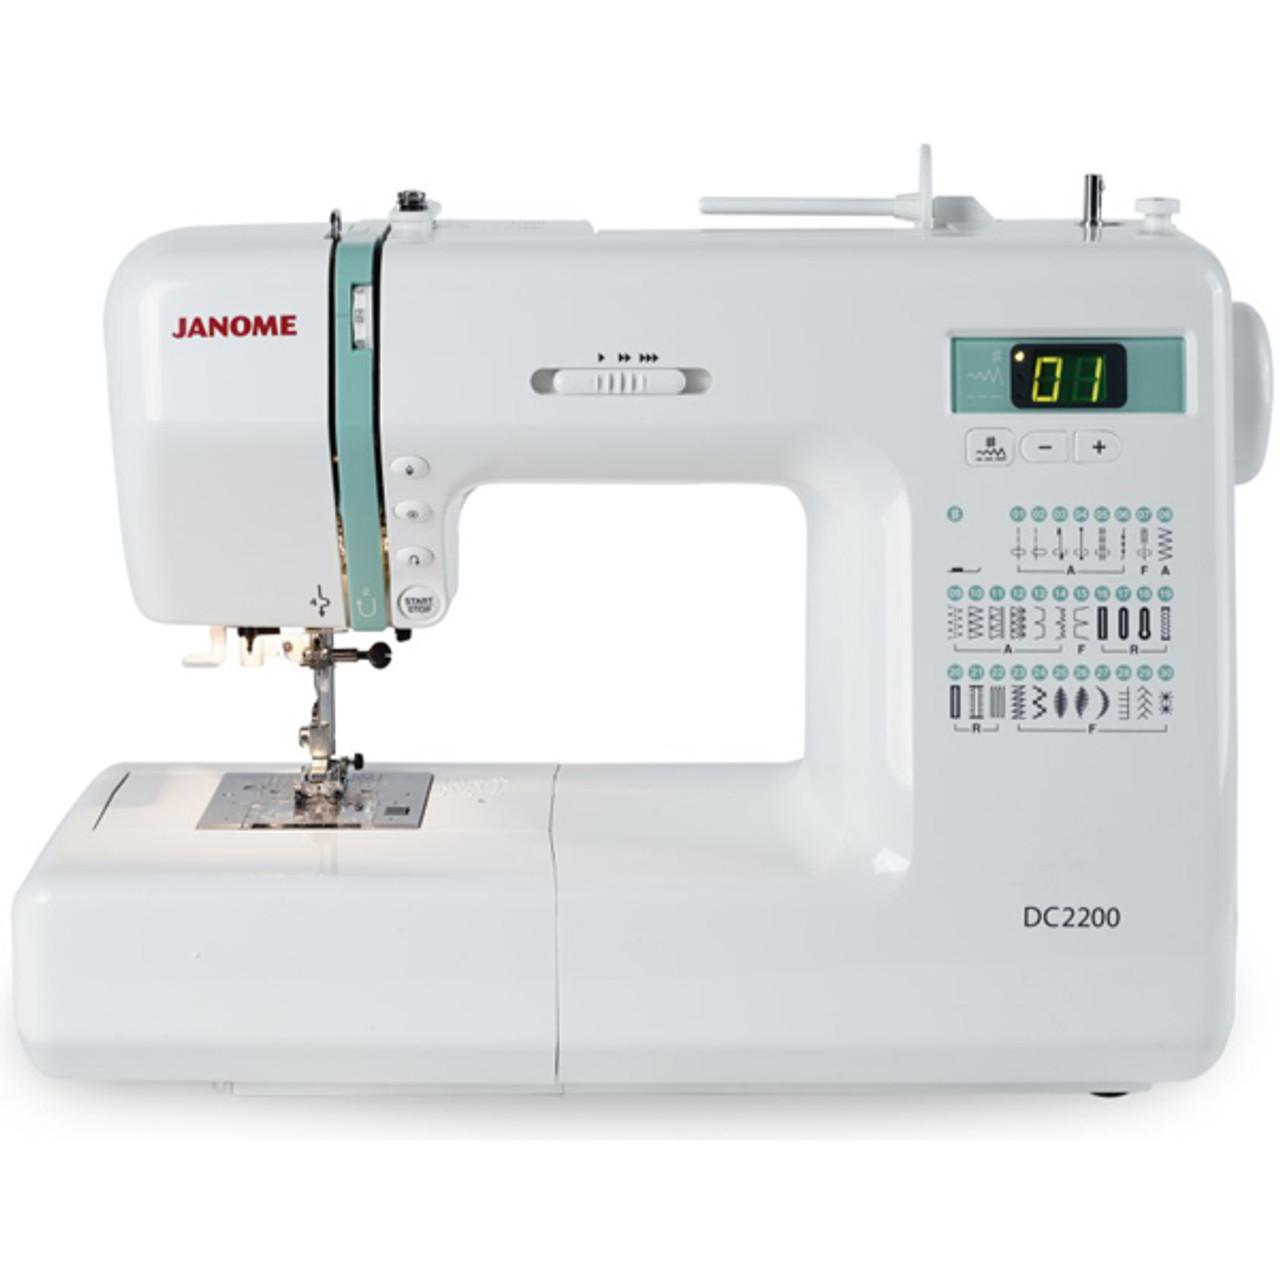 Janome DC2200